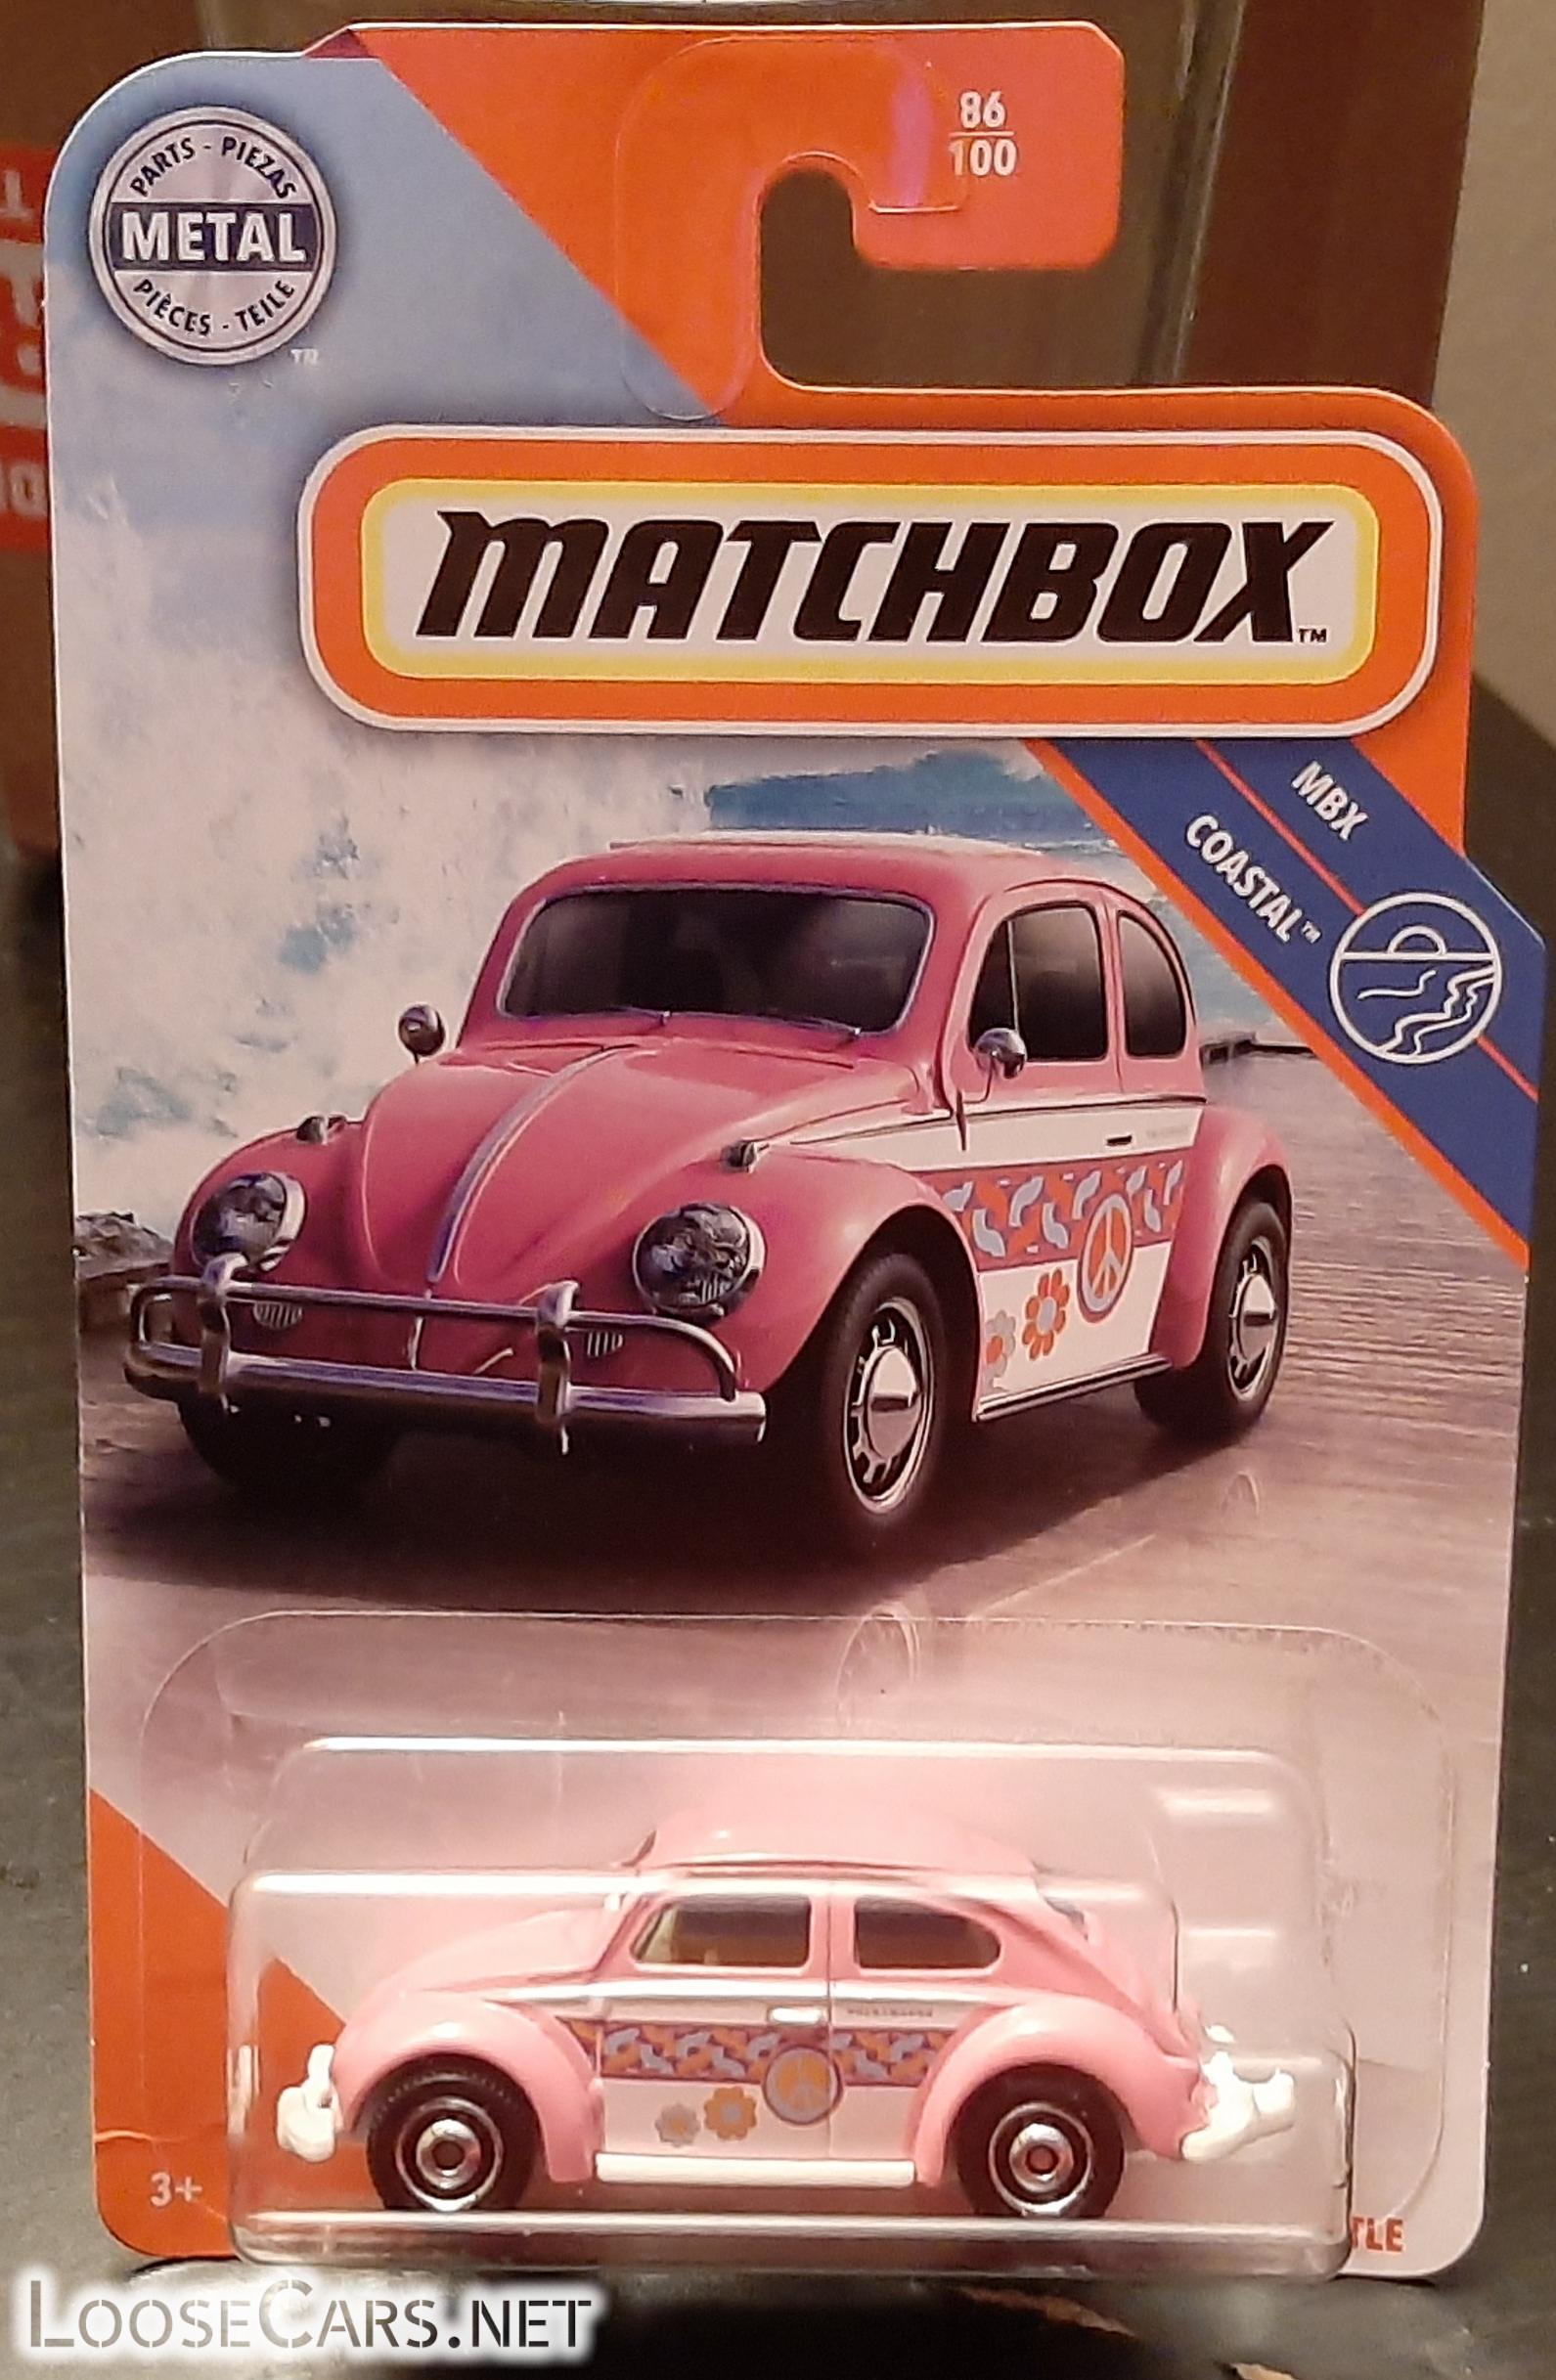 Matchbox 1967 Volkswagen Beetle: 2002 #86 Carded